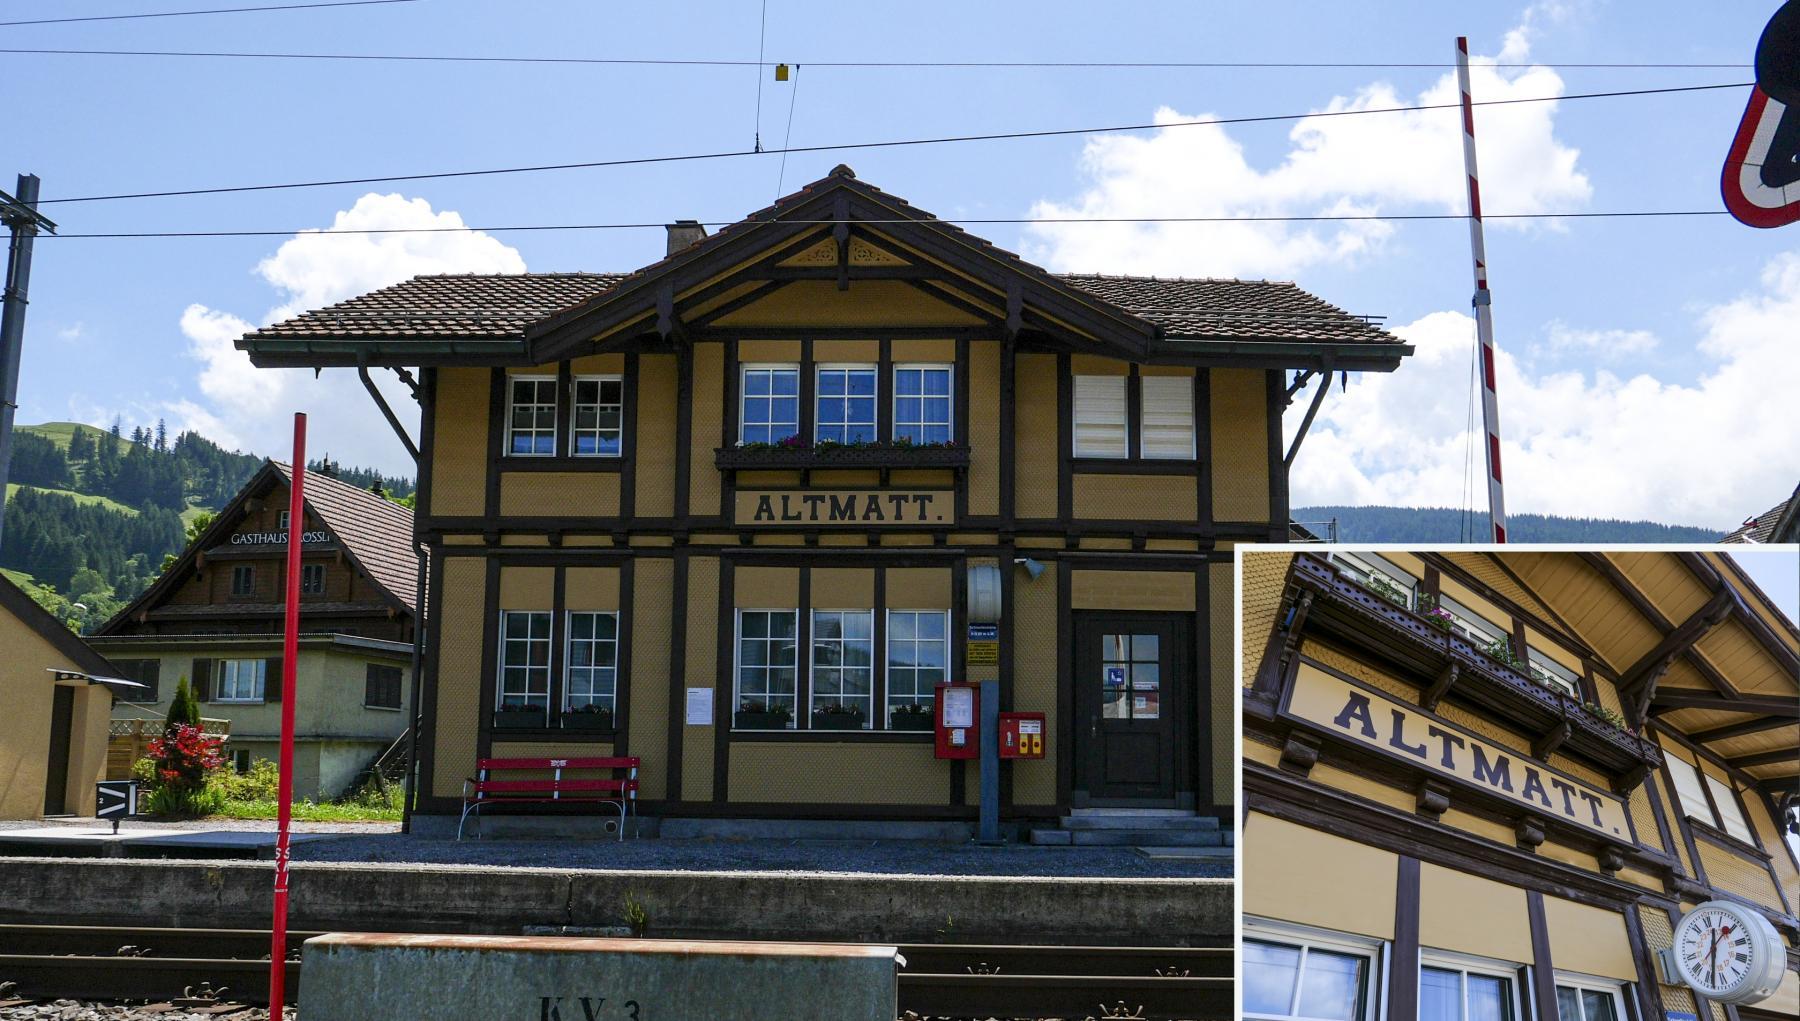 19 Waldmatt Bahnhof